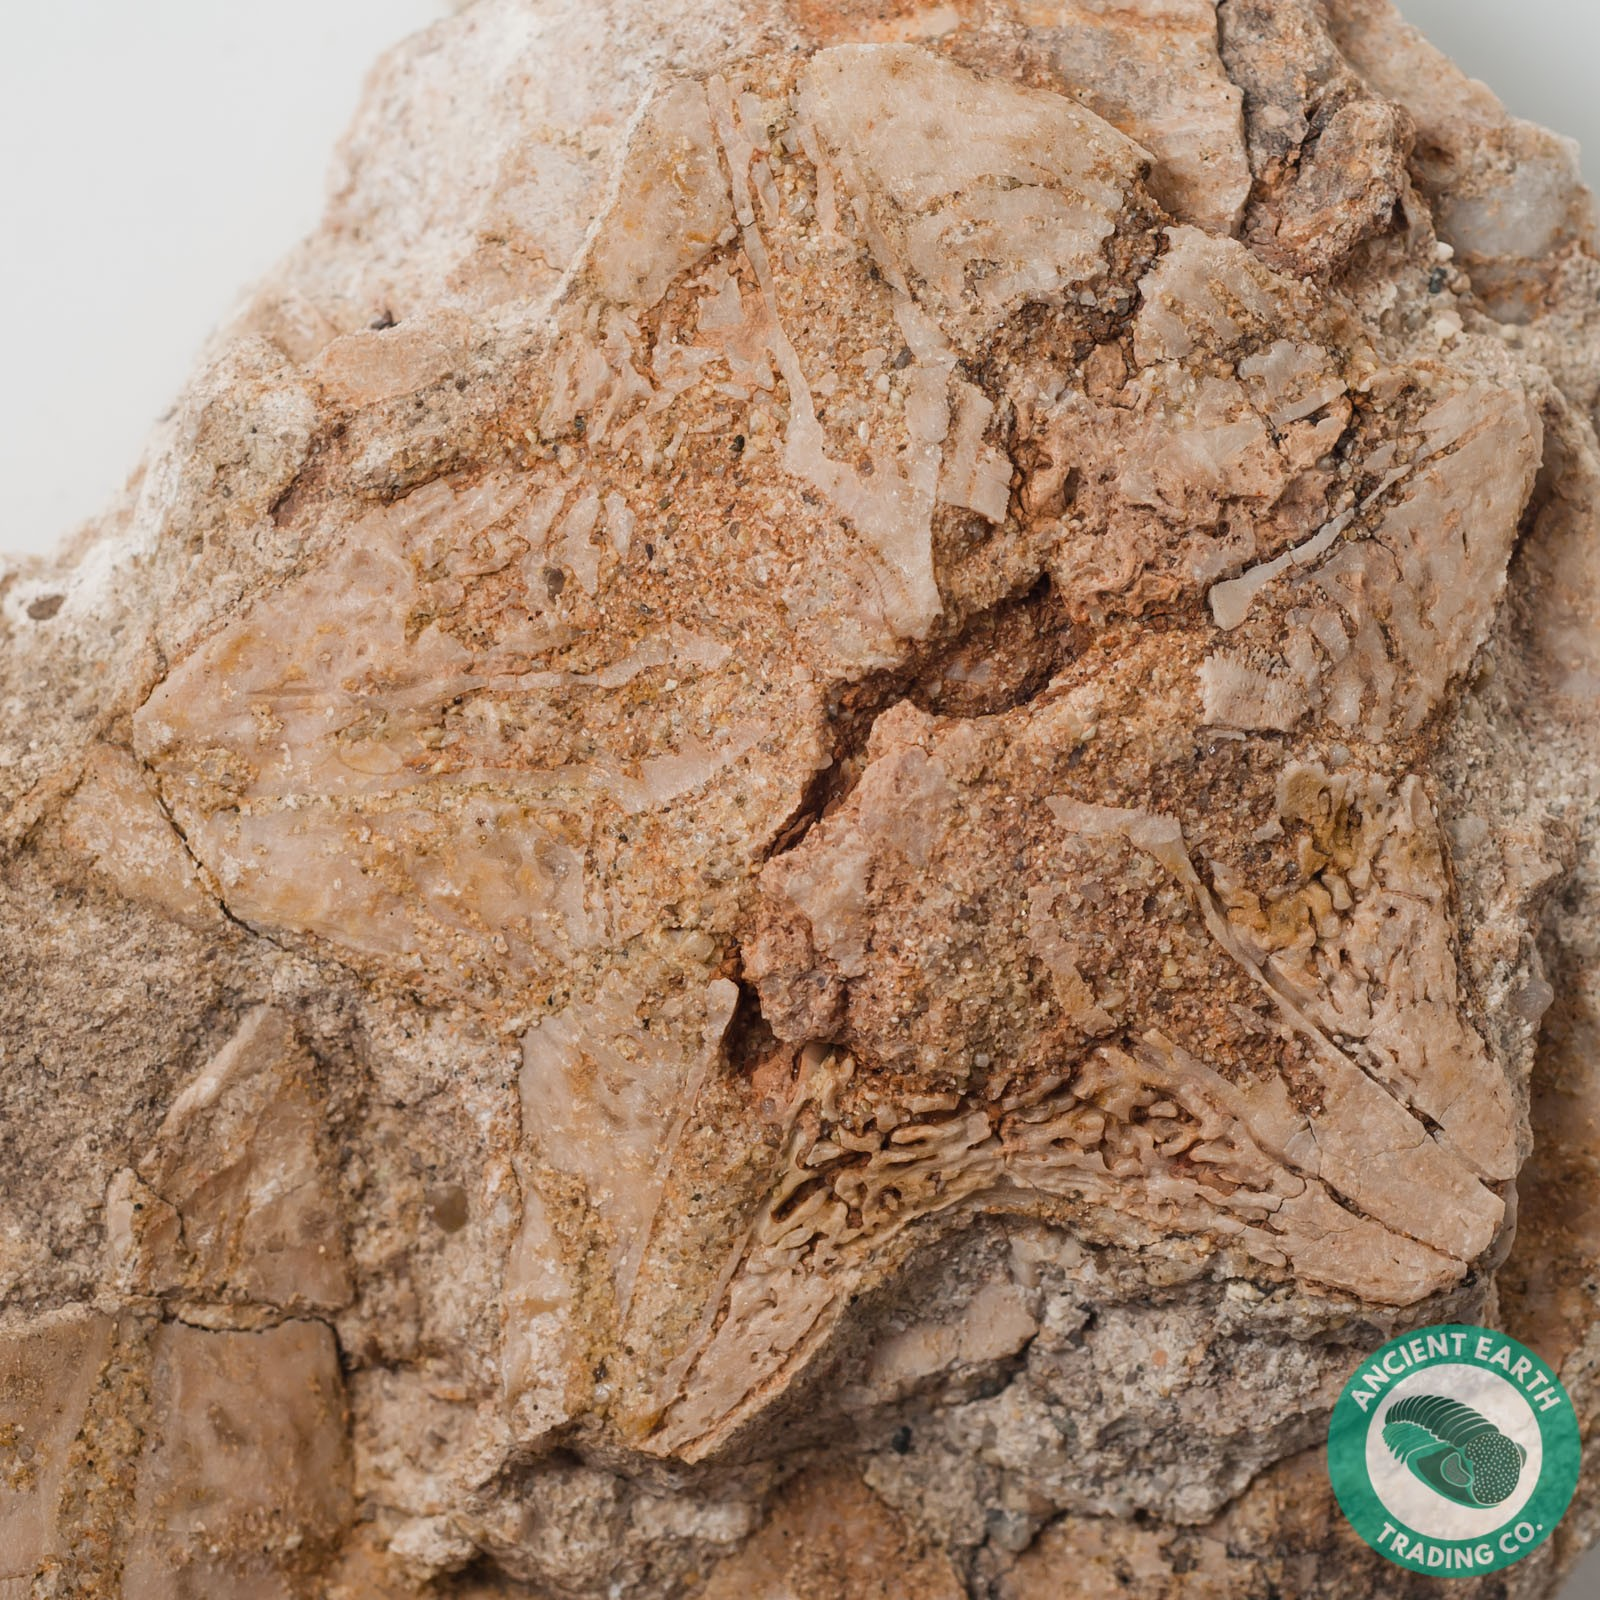 3.22 in. Vaquerosella Star Shape Sand Dollar Fossil on Matrix - California